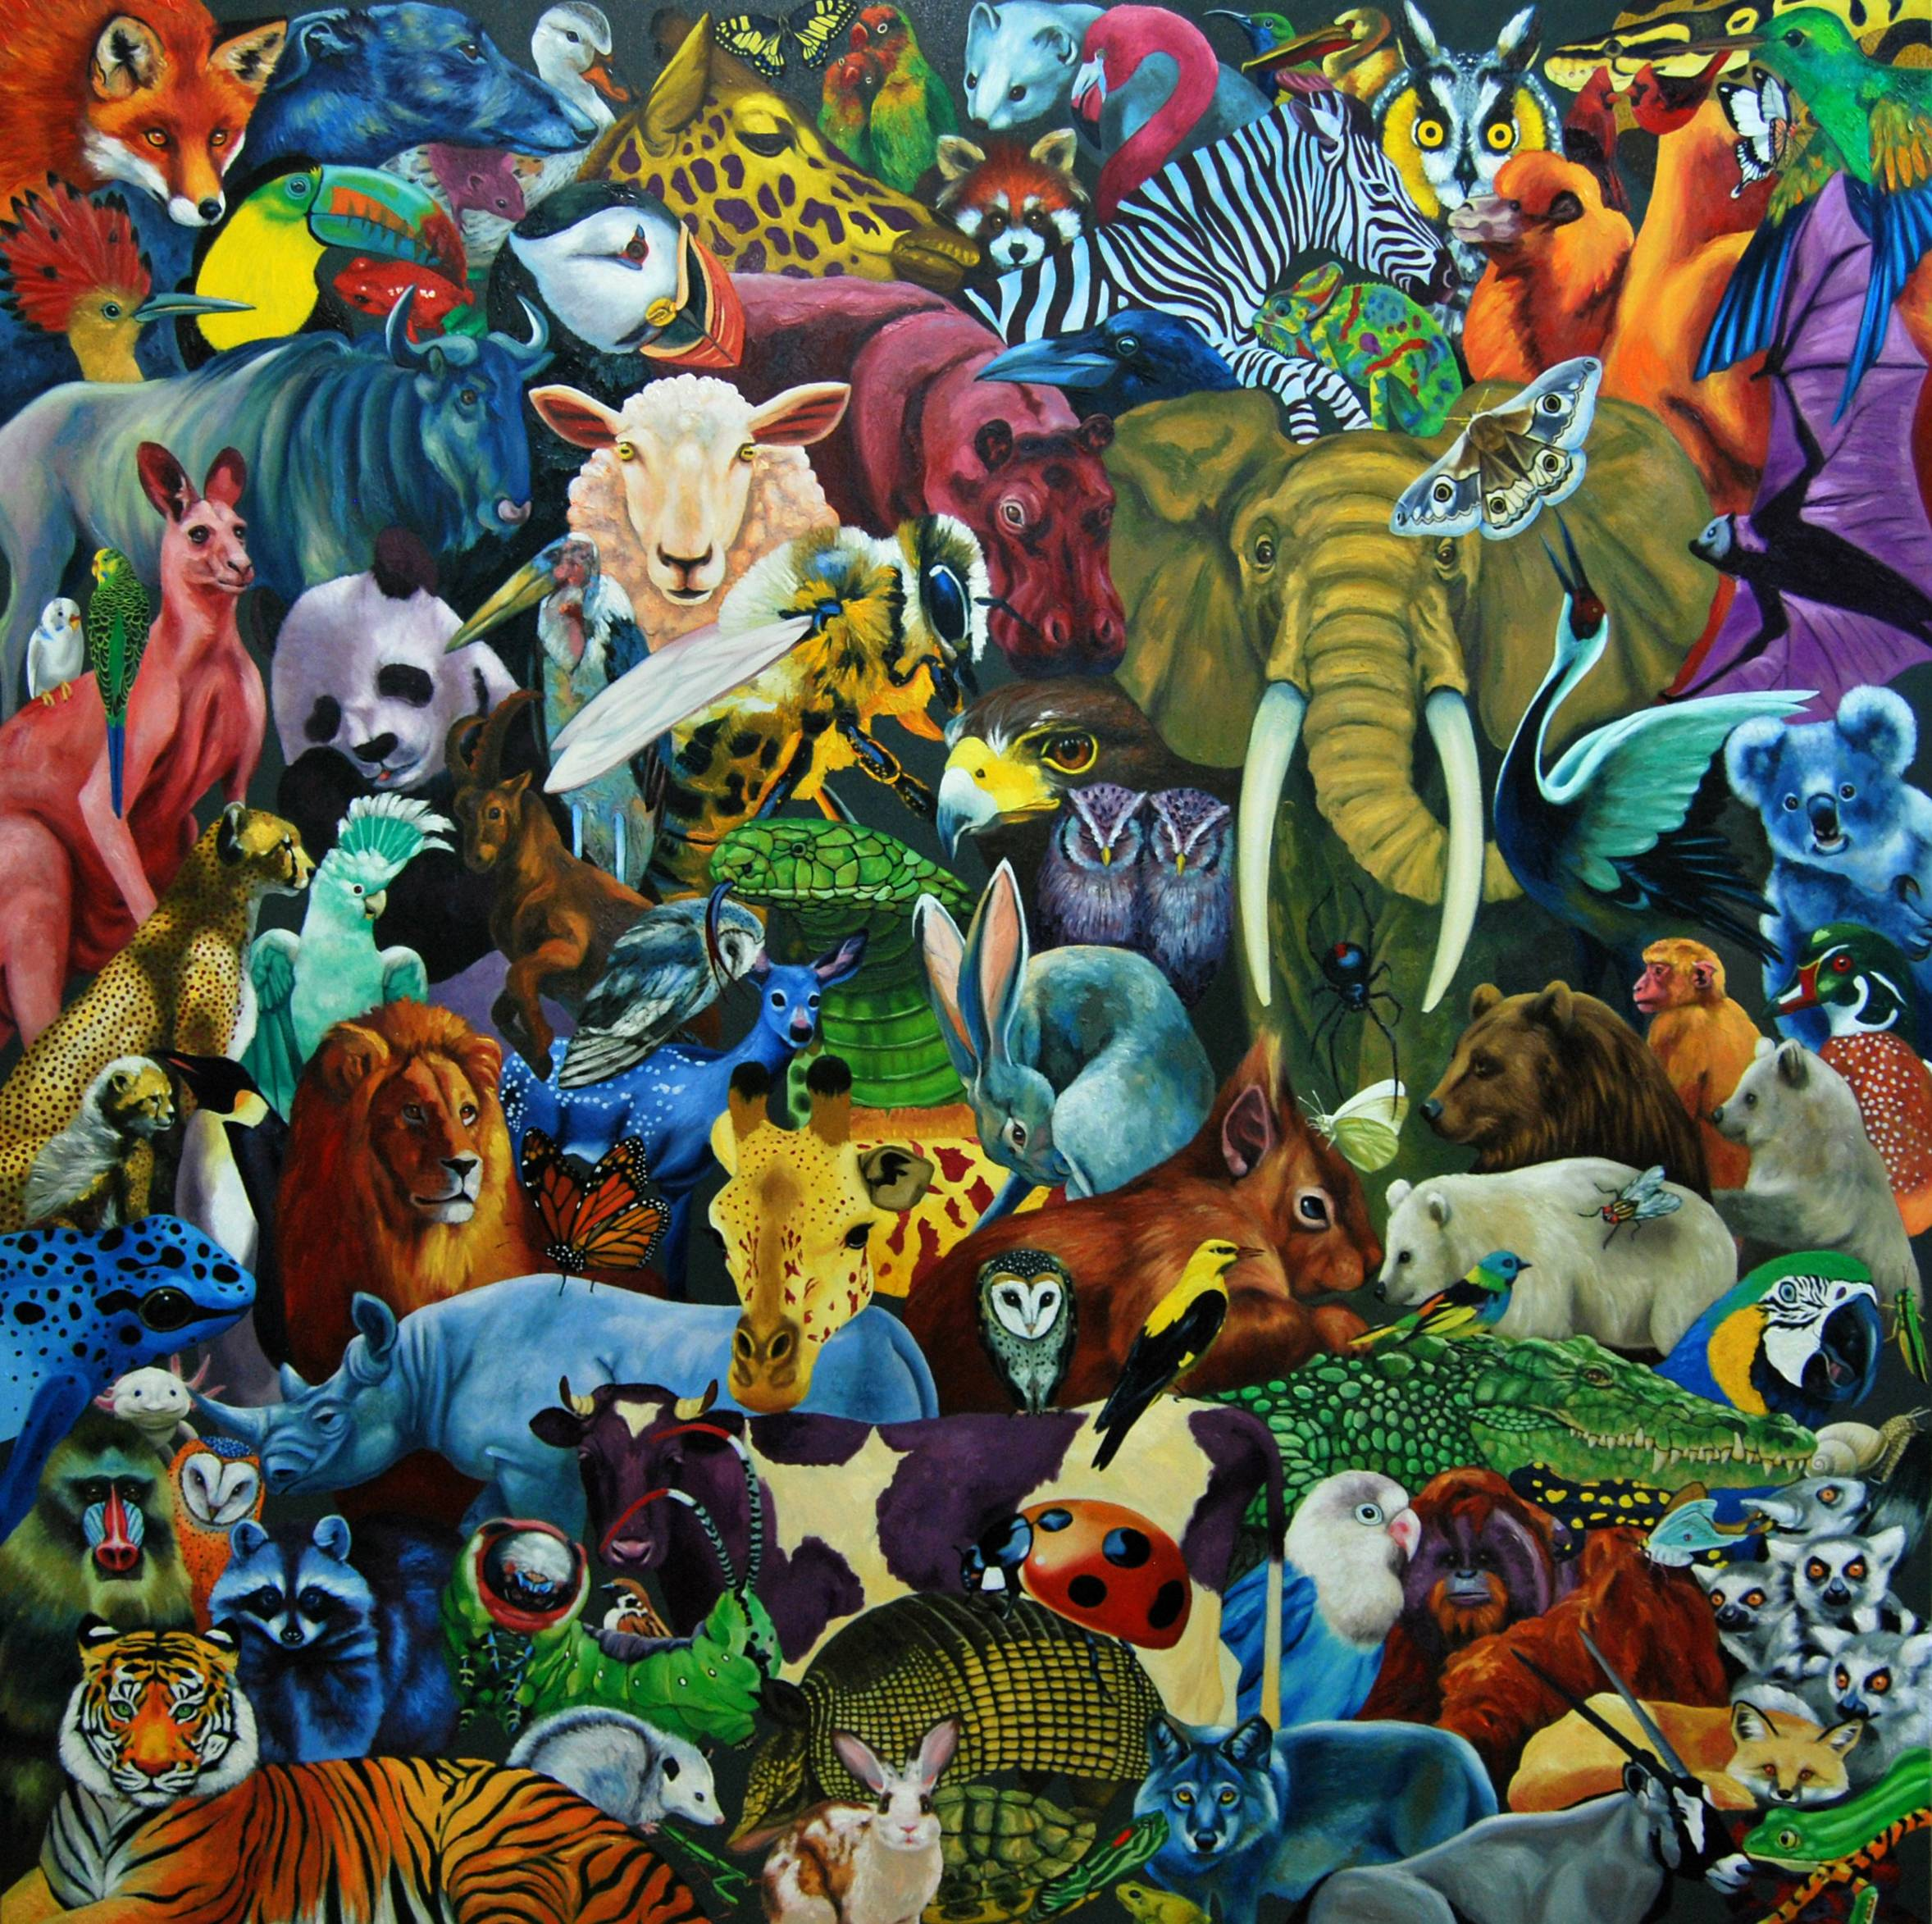 Detalle Obra Bestiario - Serie Colorzoo - Artista Antonio Morales Prats